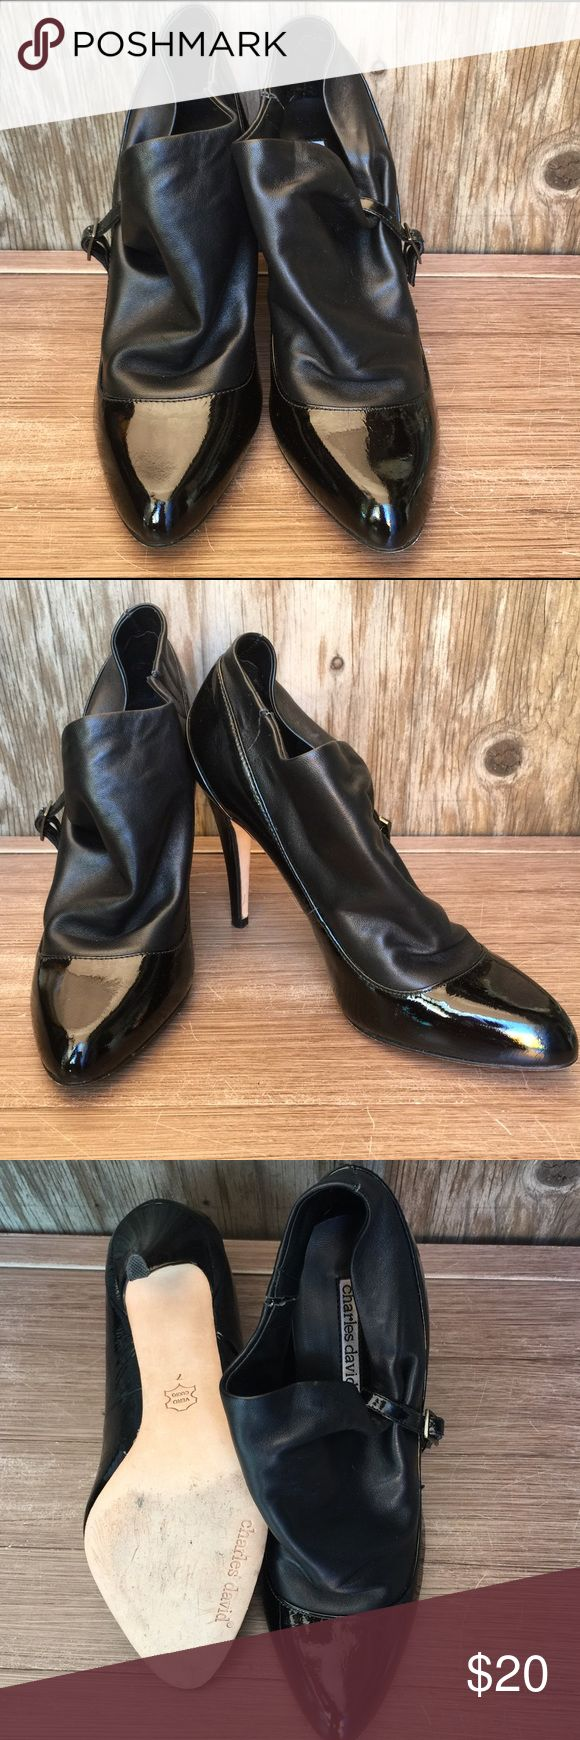 Heels 👠 Excellent Condition. Charles David Charles David Shoes Heels